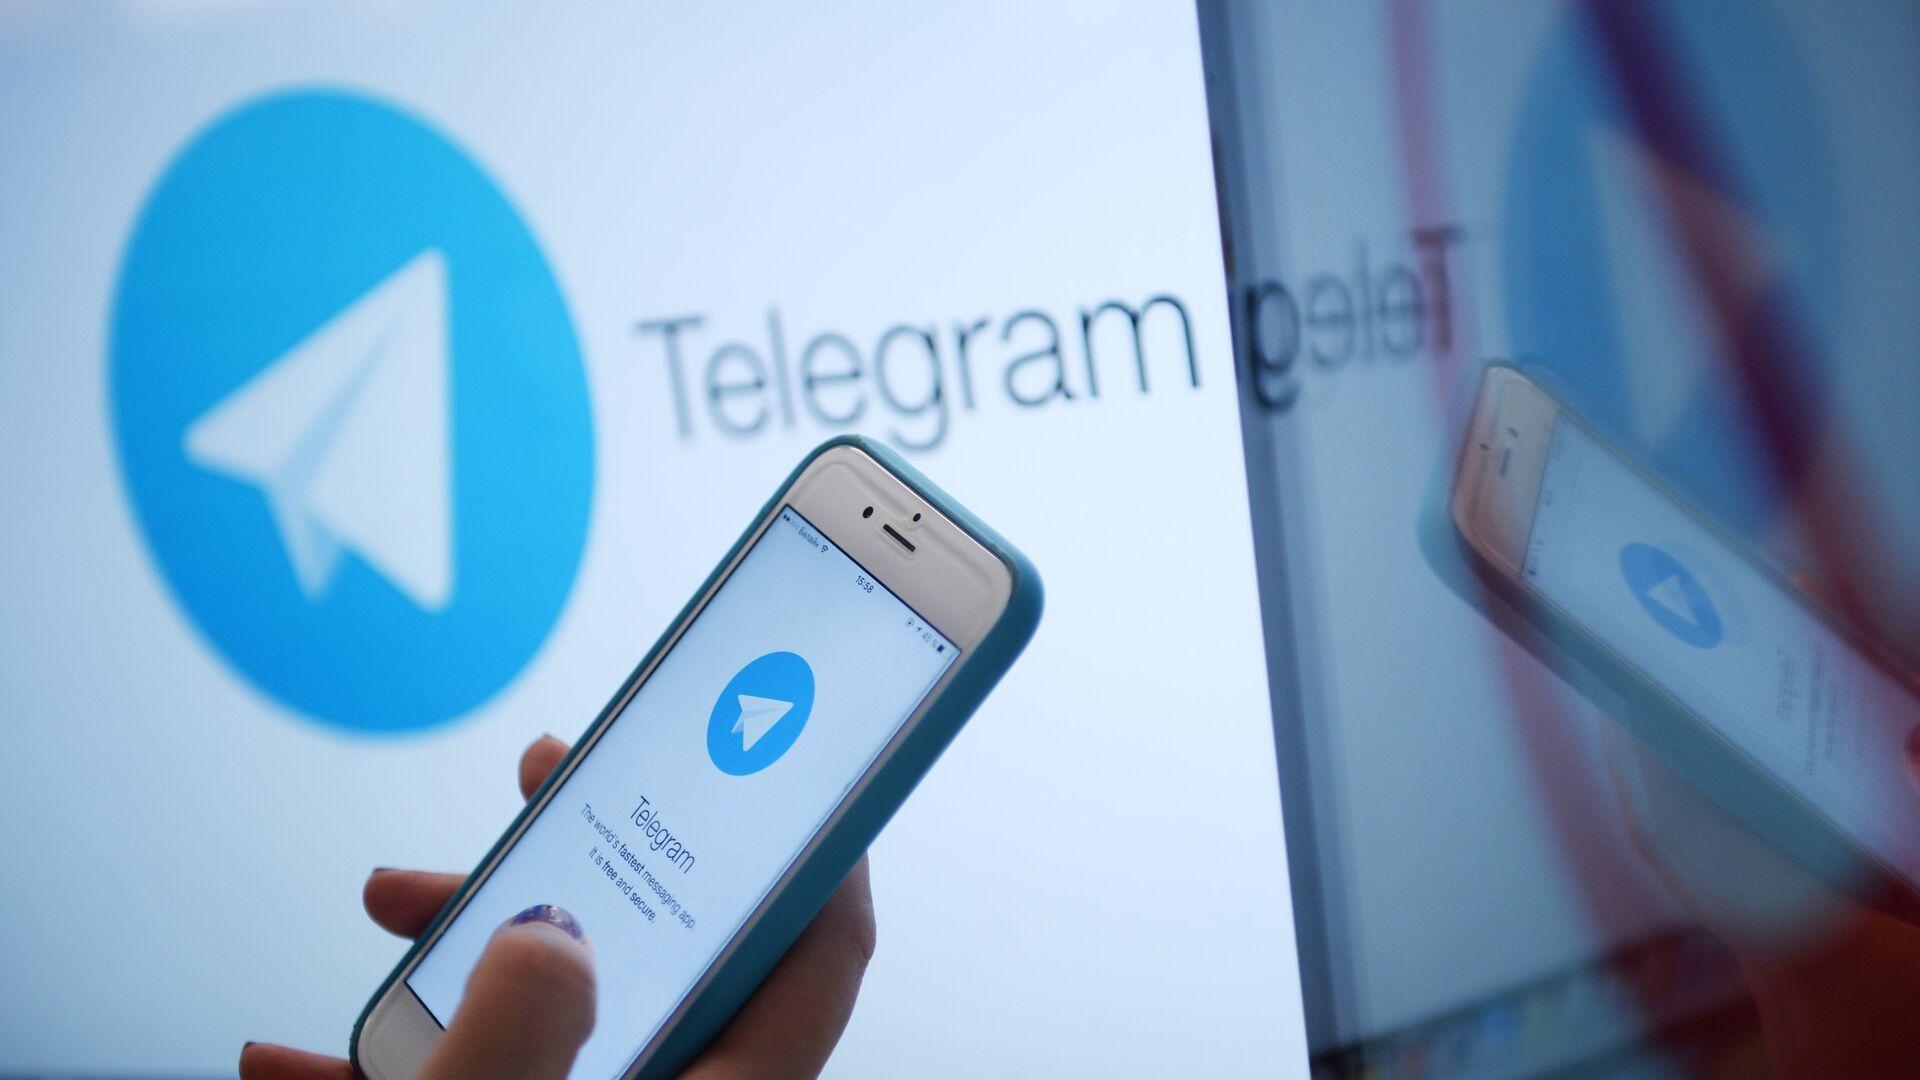 Логотип мессенджера Telegram на экране монитора и телефона - РИА Новости, 1920, 12.01.2021